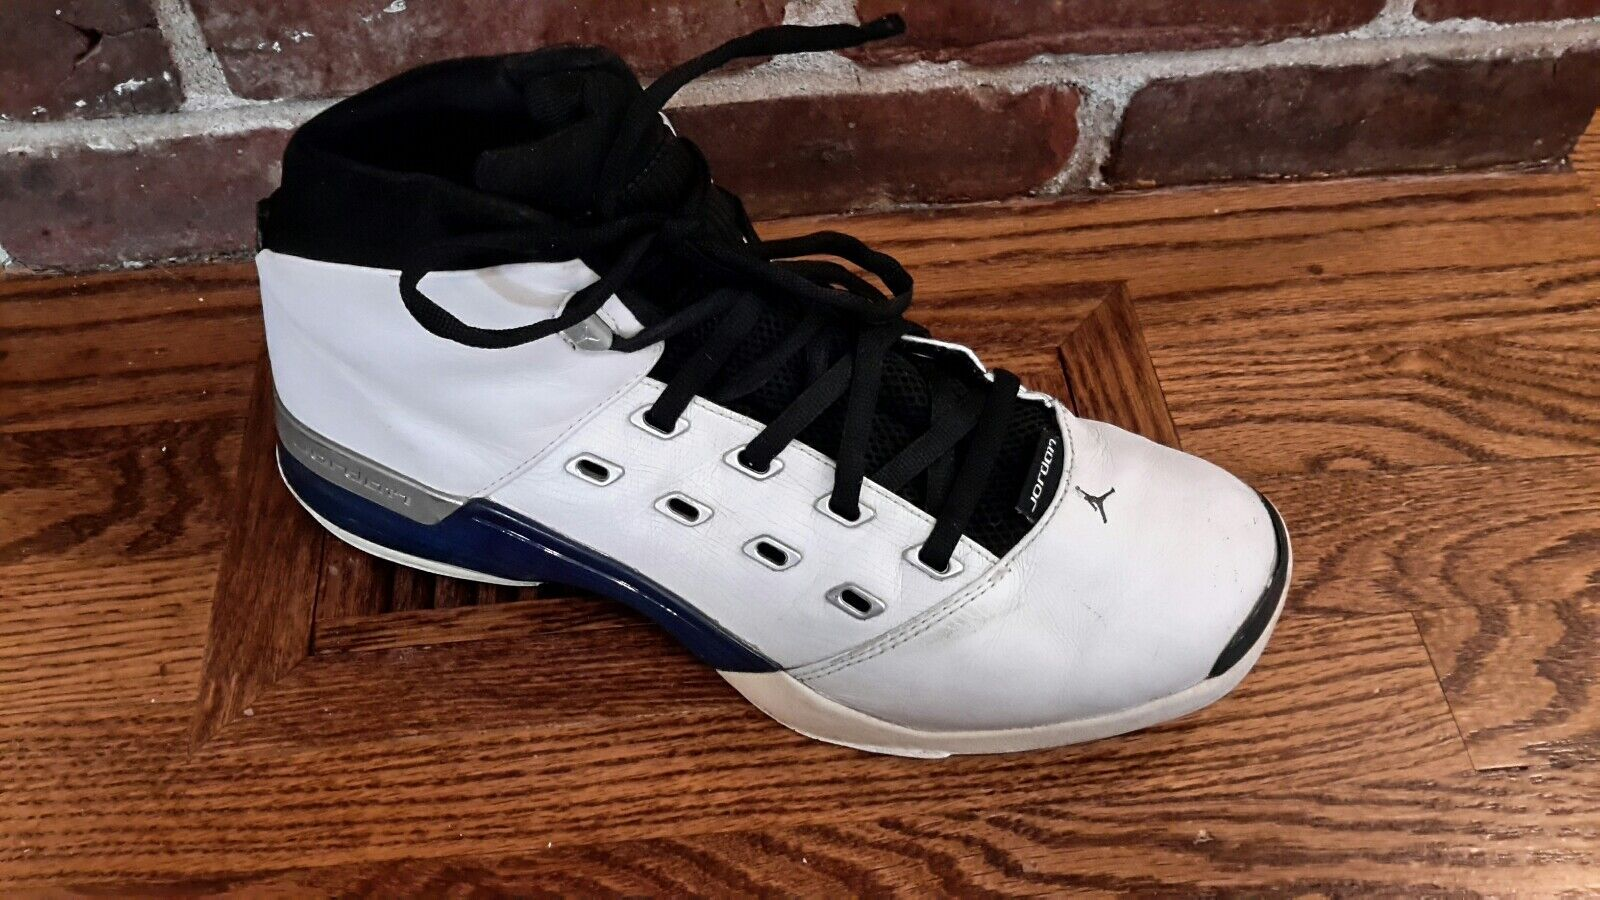 2002 Nike Air Jordan 17 White College Blue Black Silver 302720-141 Size 13